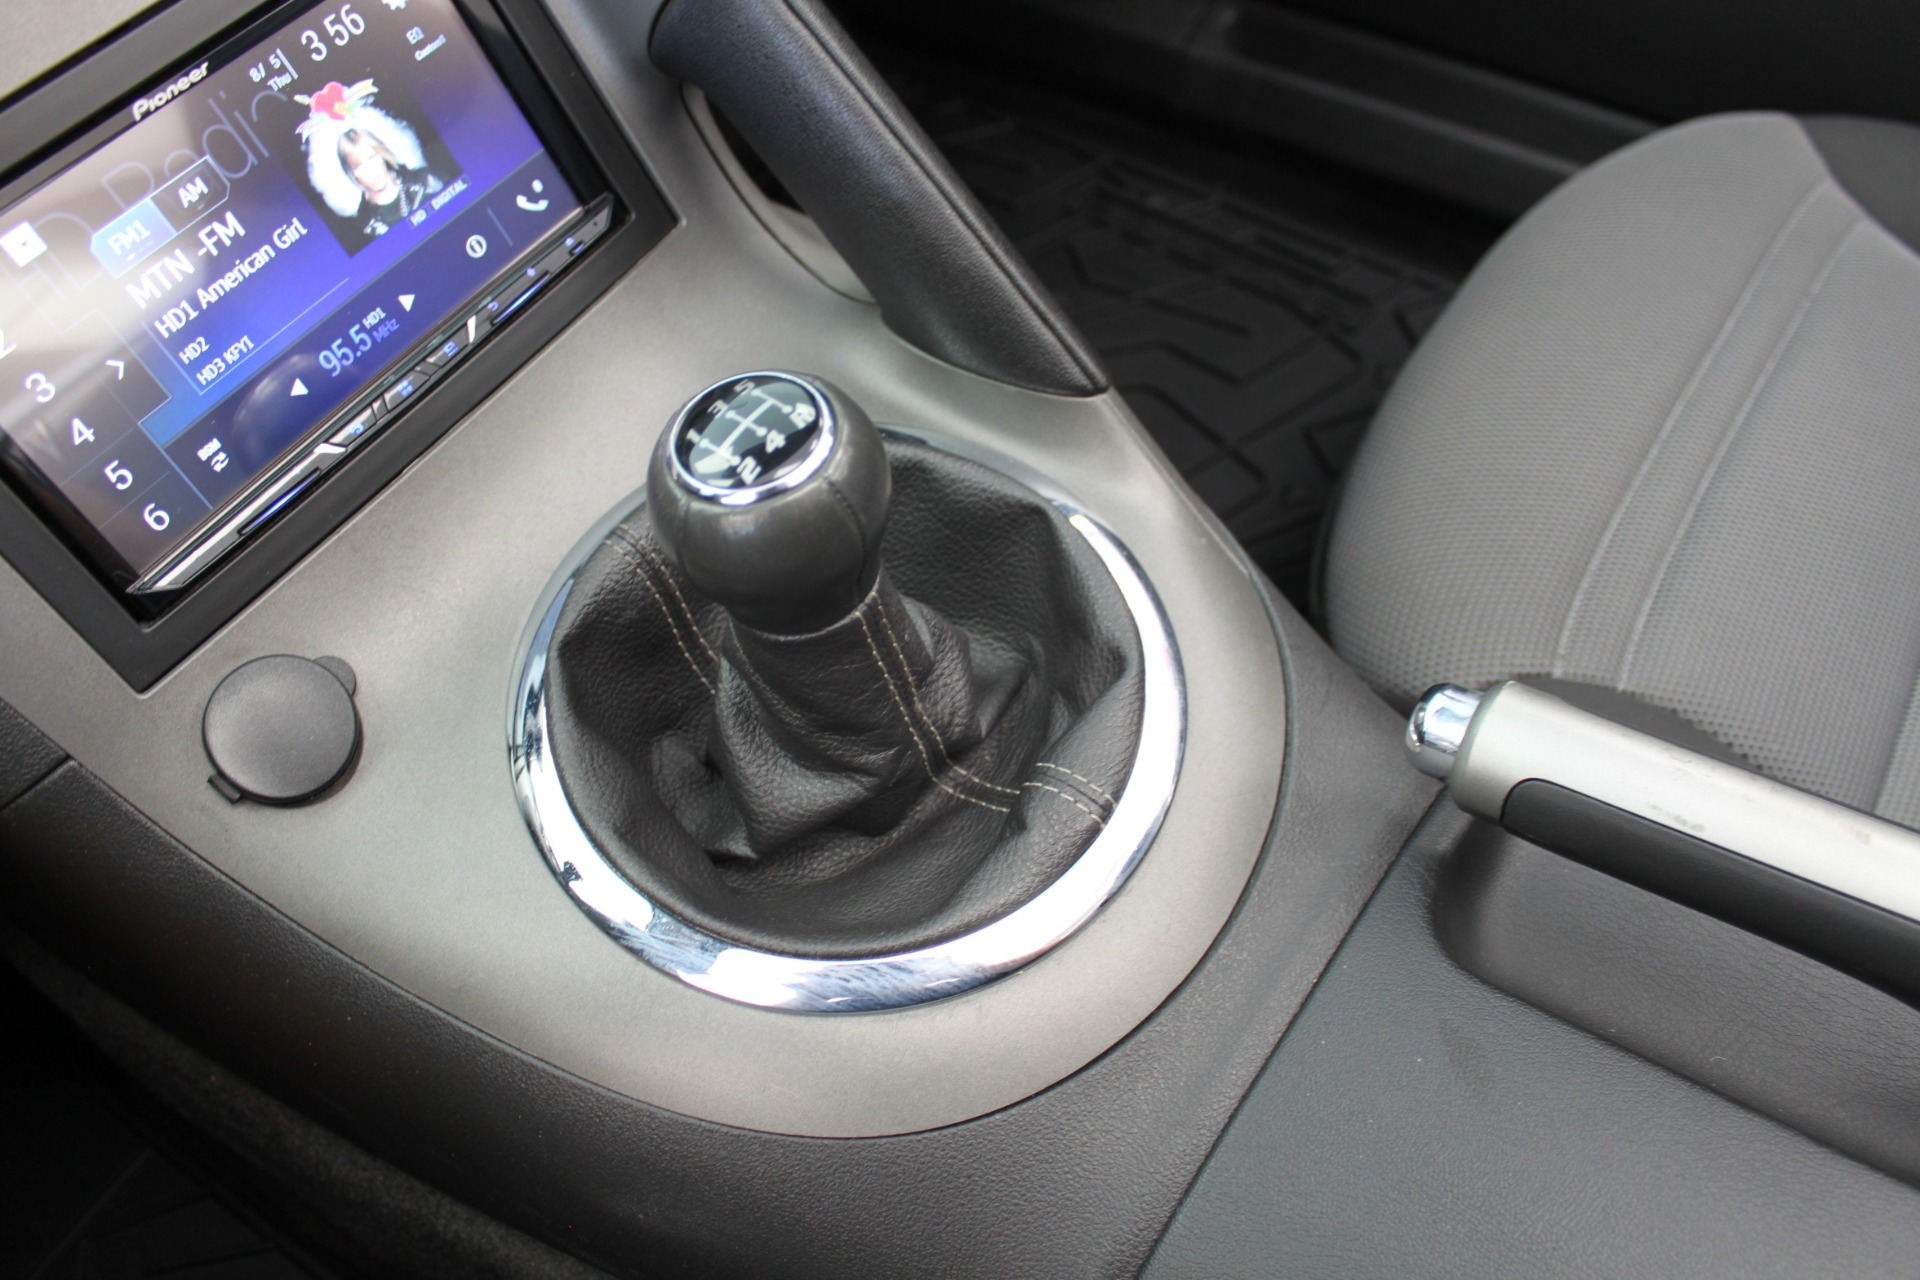 Used-2009-Pontiac-Solstice-Convertible-Acura